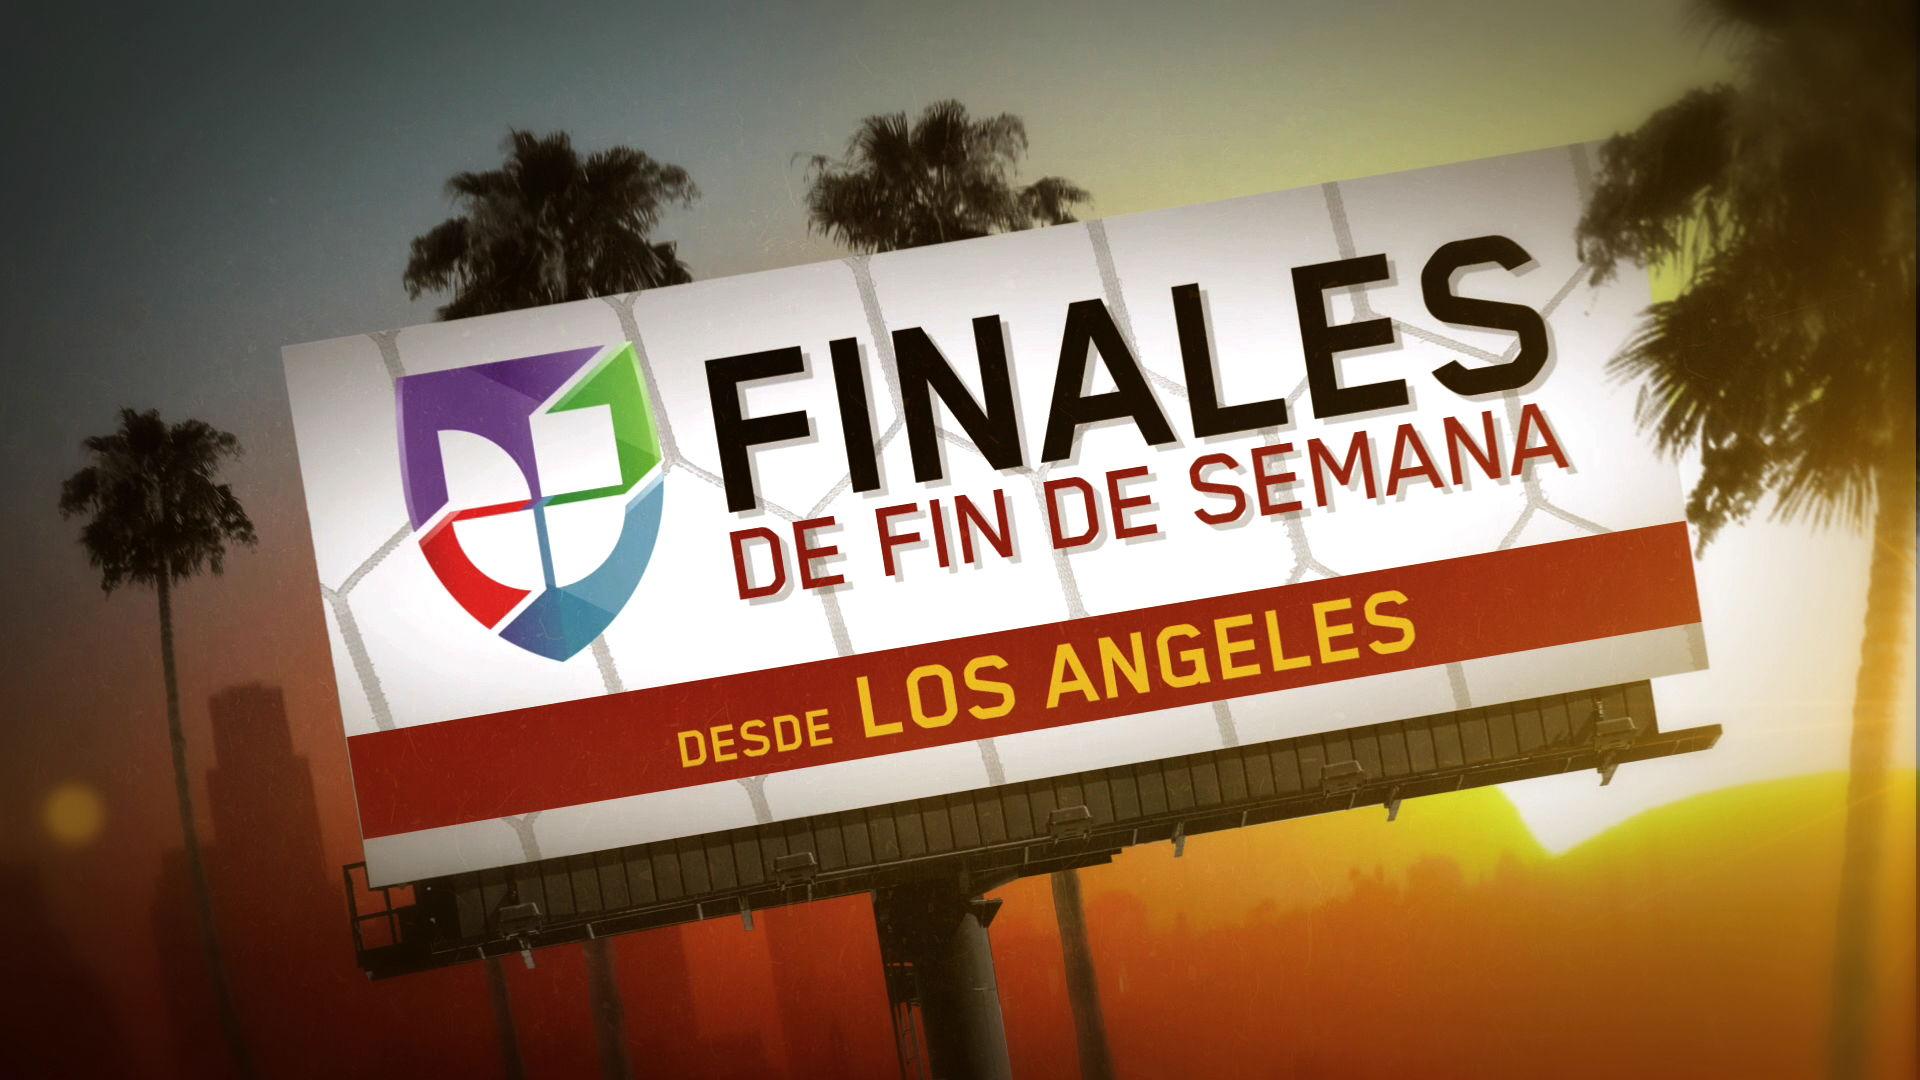 Finales de Fin de Semana